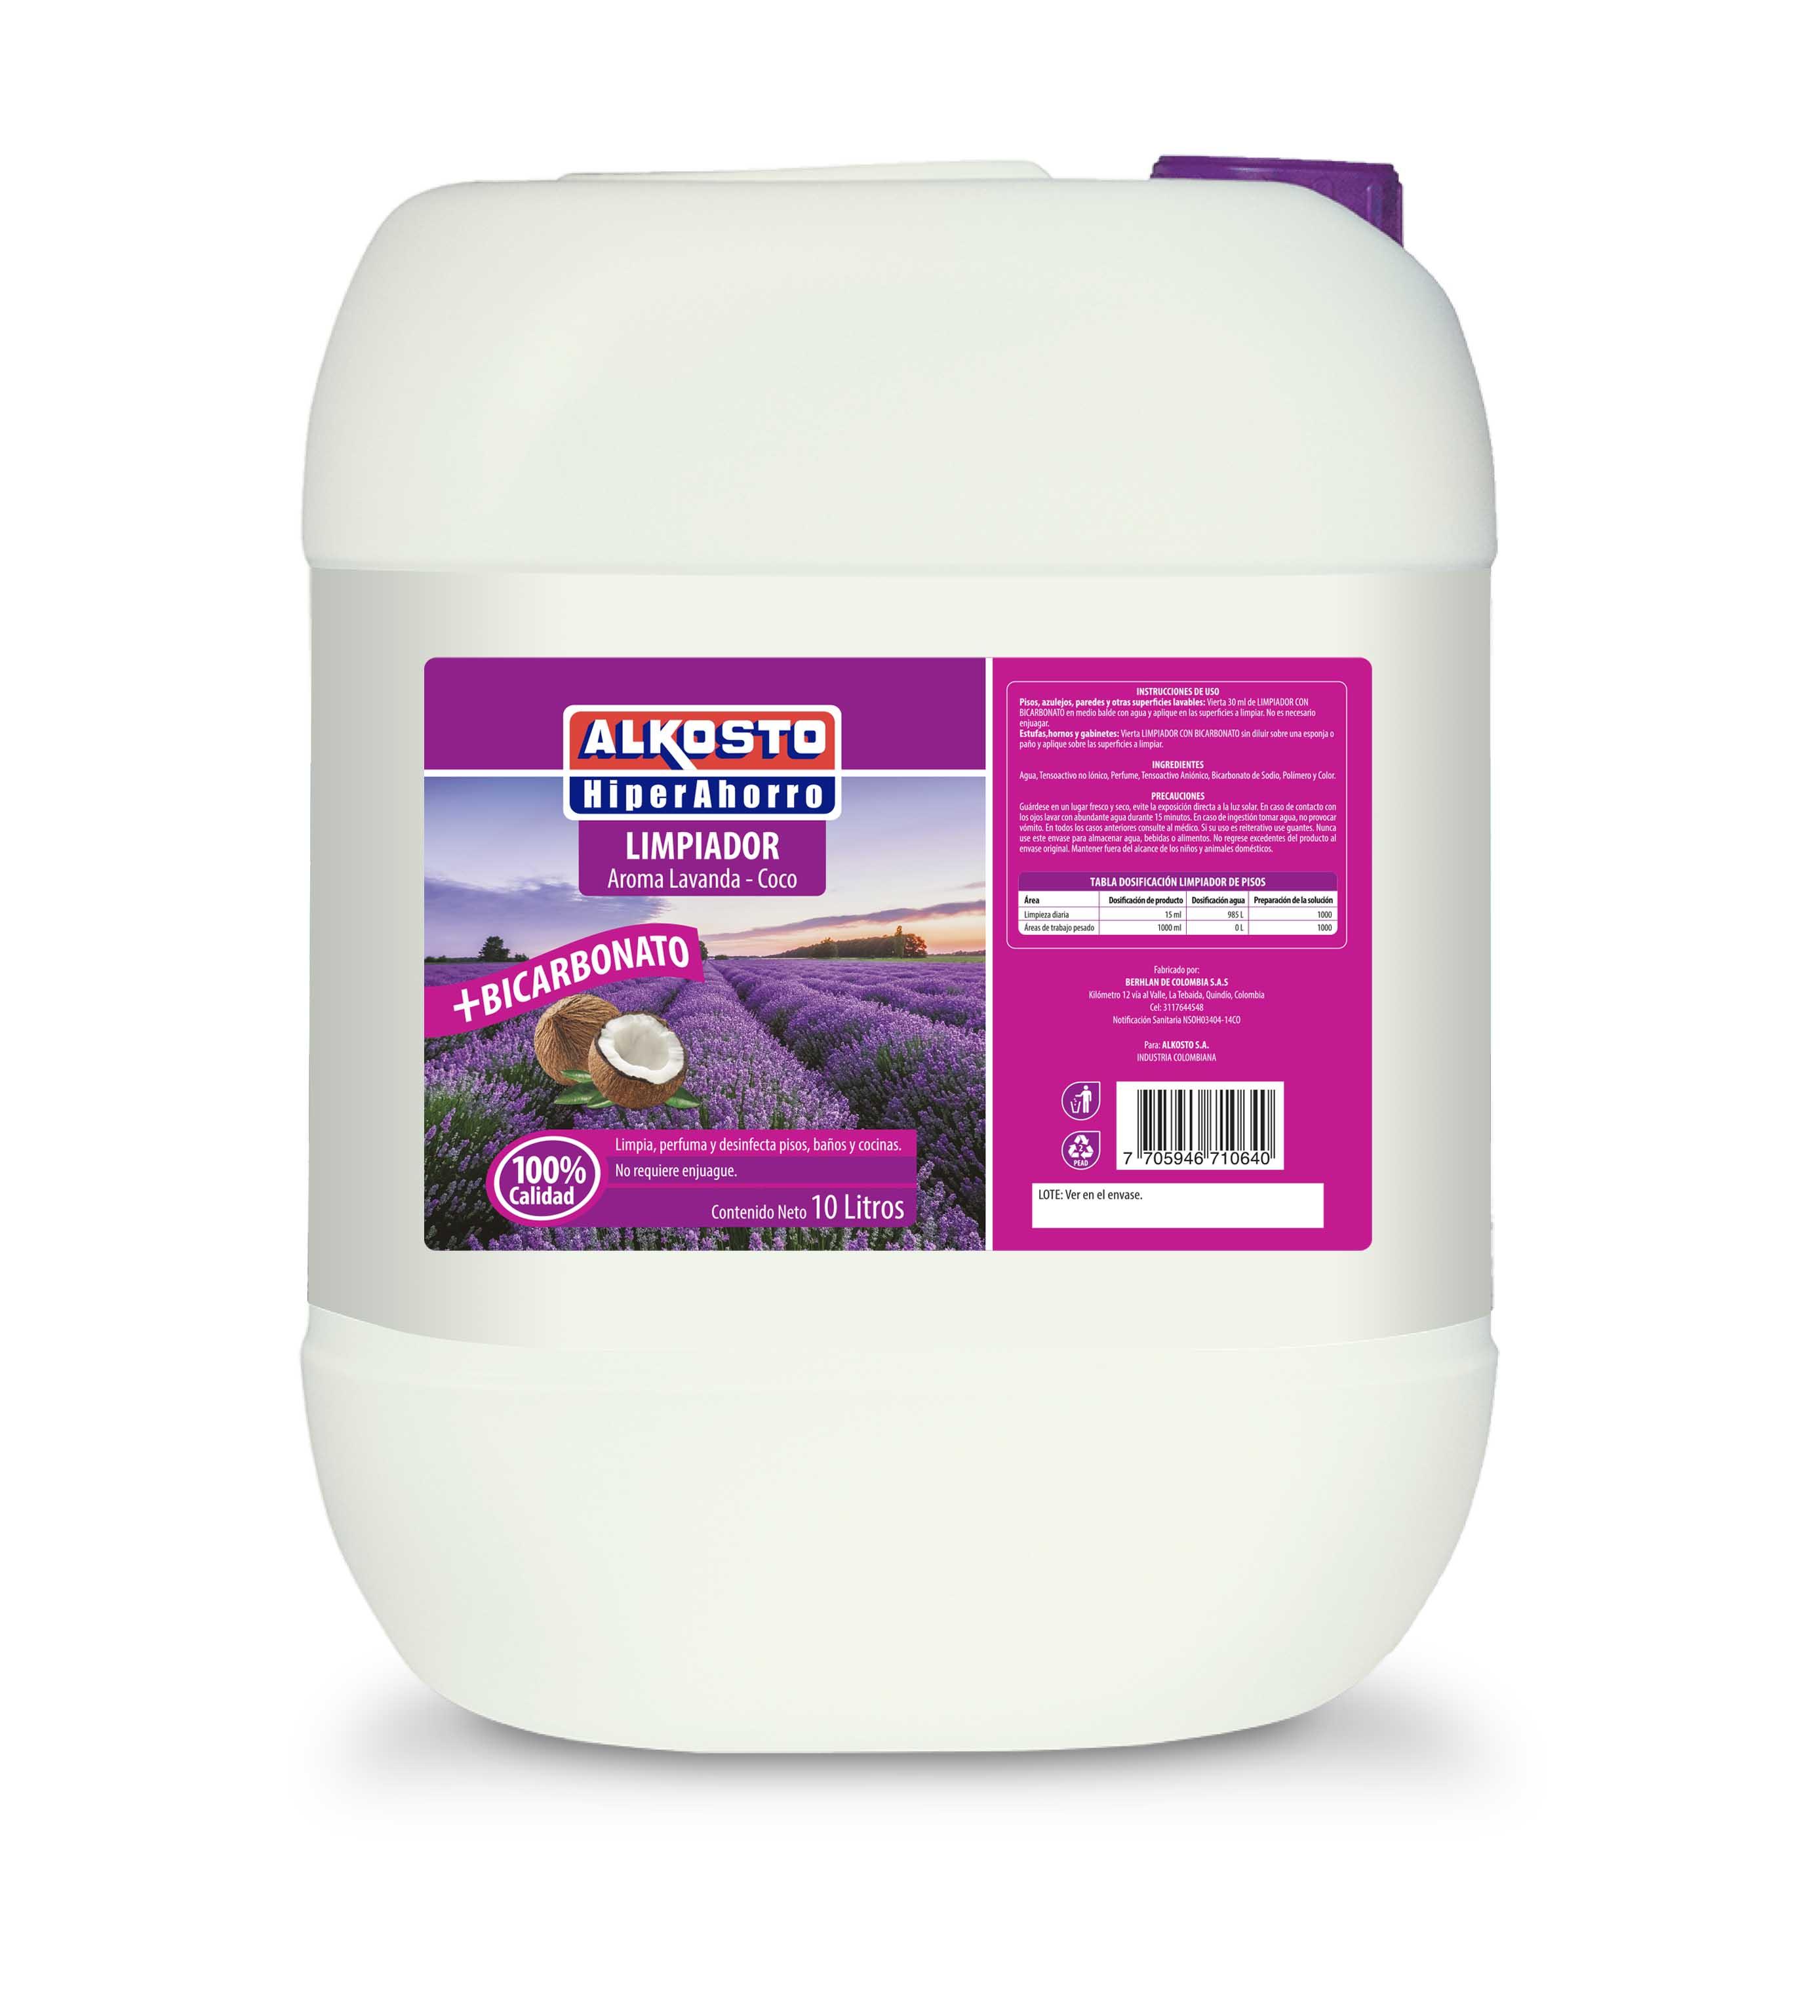 Limpiador Pisos Alkosto Aroma Coco Bicarbonato 10l